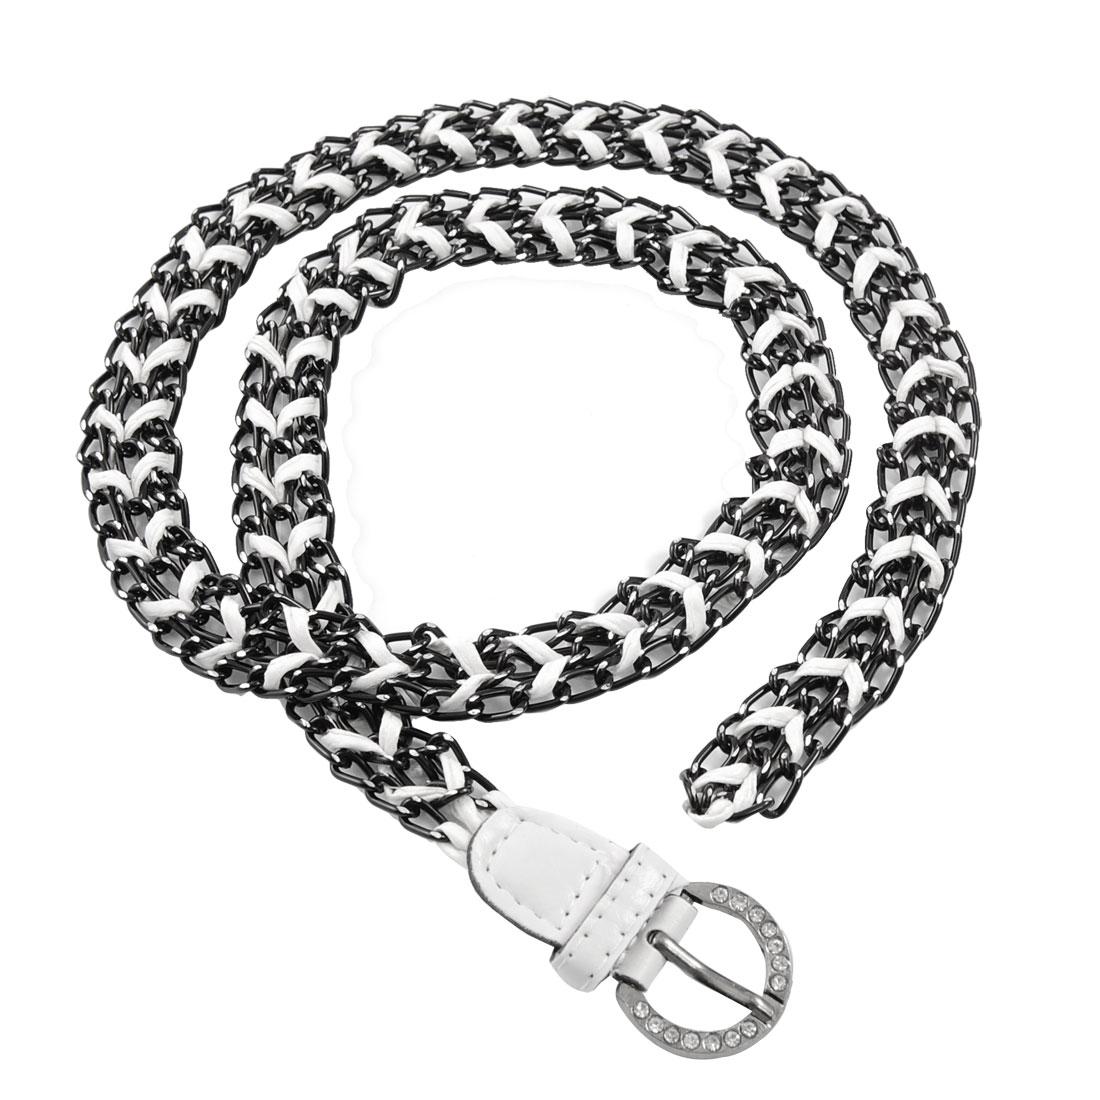 Women Rhinestone Decor Buckle Black Aluminum Braided Faux Leather Waist Belt